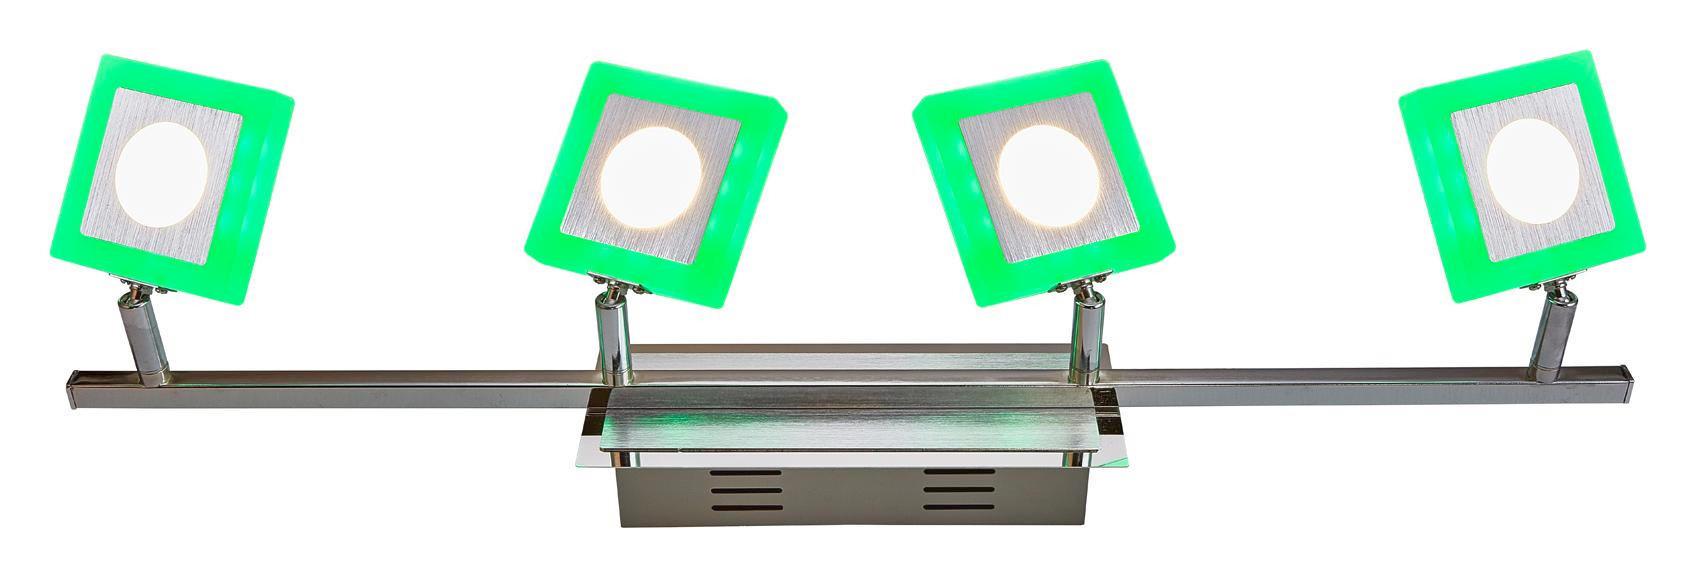 LED-STRAHLER - Chromfarben, Design, Kunststoff/Metall (67,5/8/20cm) - NOVEL